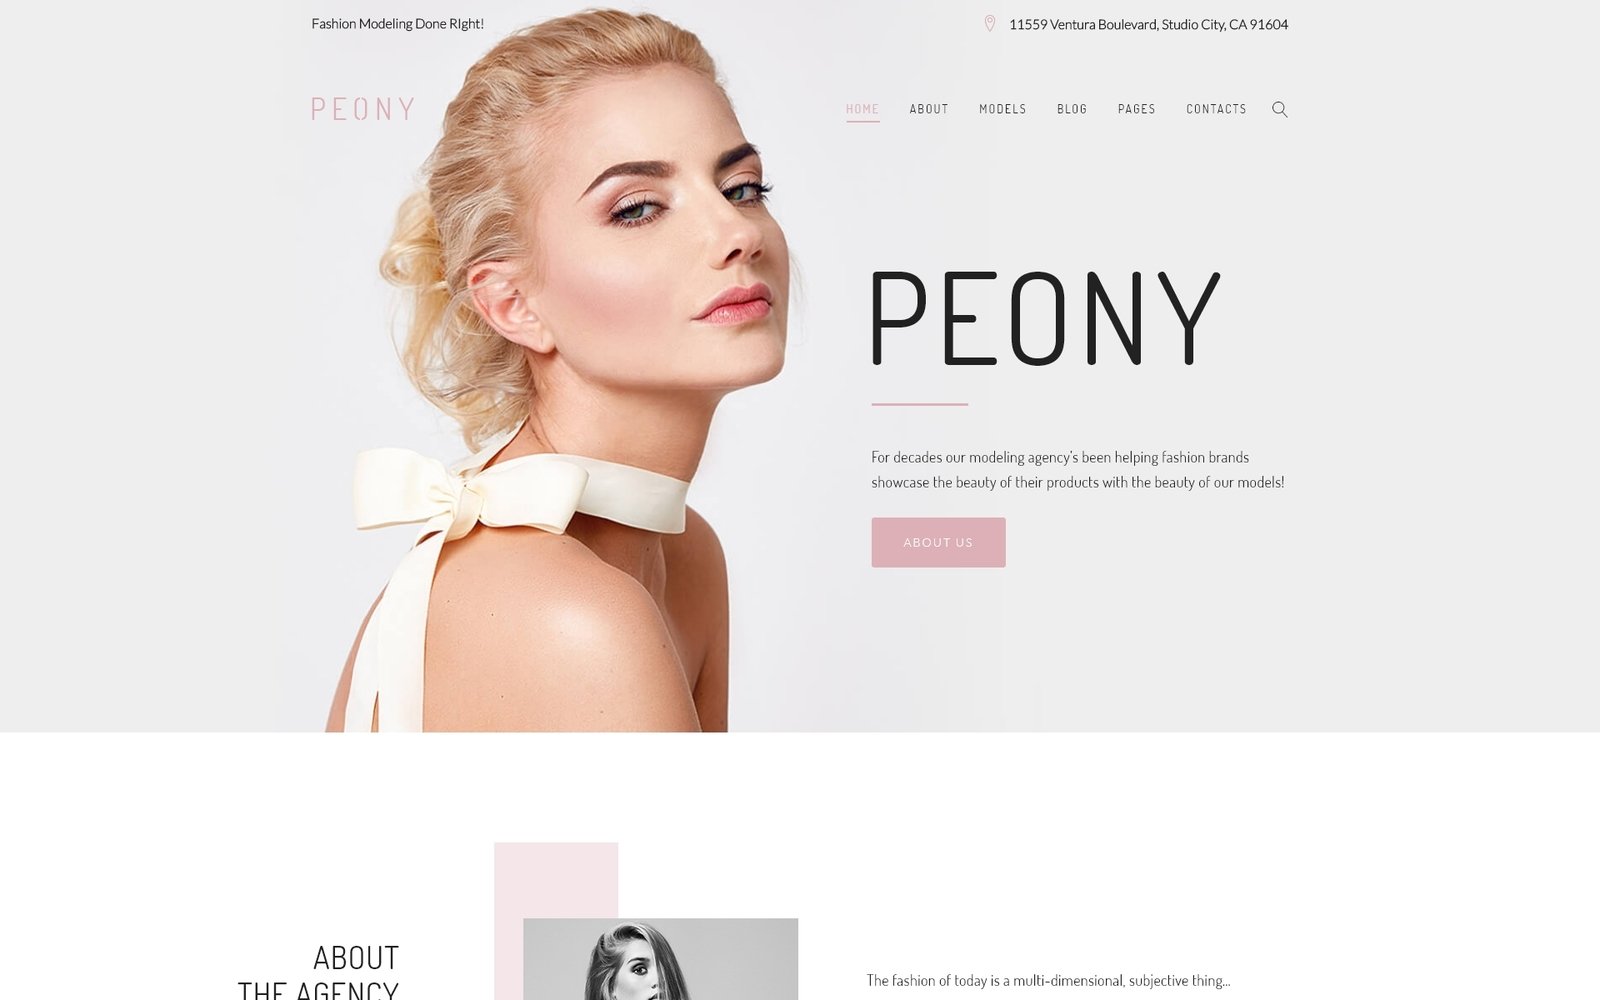 Peony - Fashion Modelling Agency №63849 - скриншот